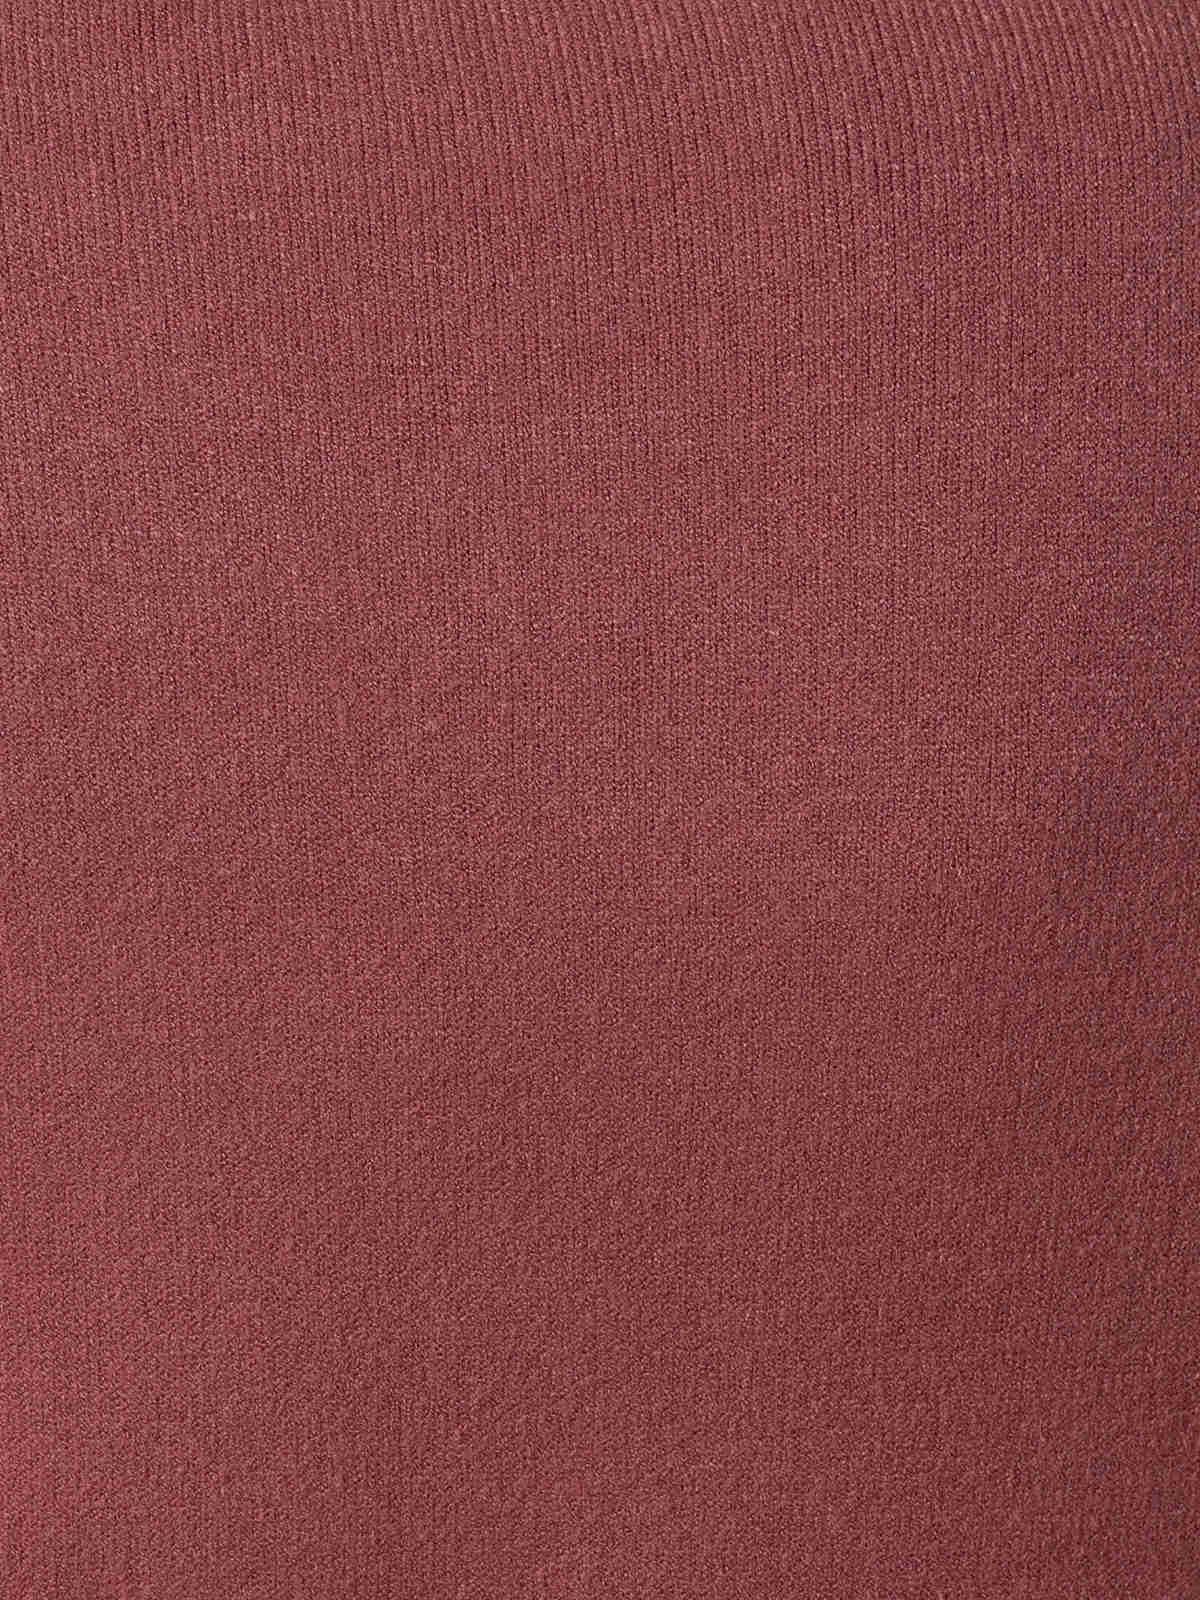 Jersey punto mujer cuello redondo Rosa